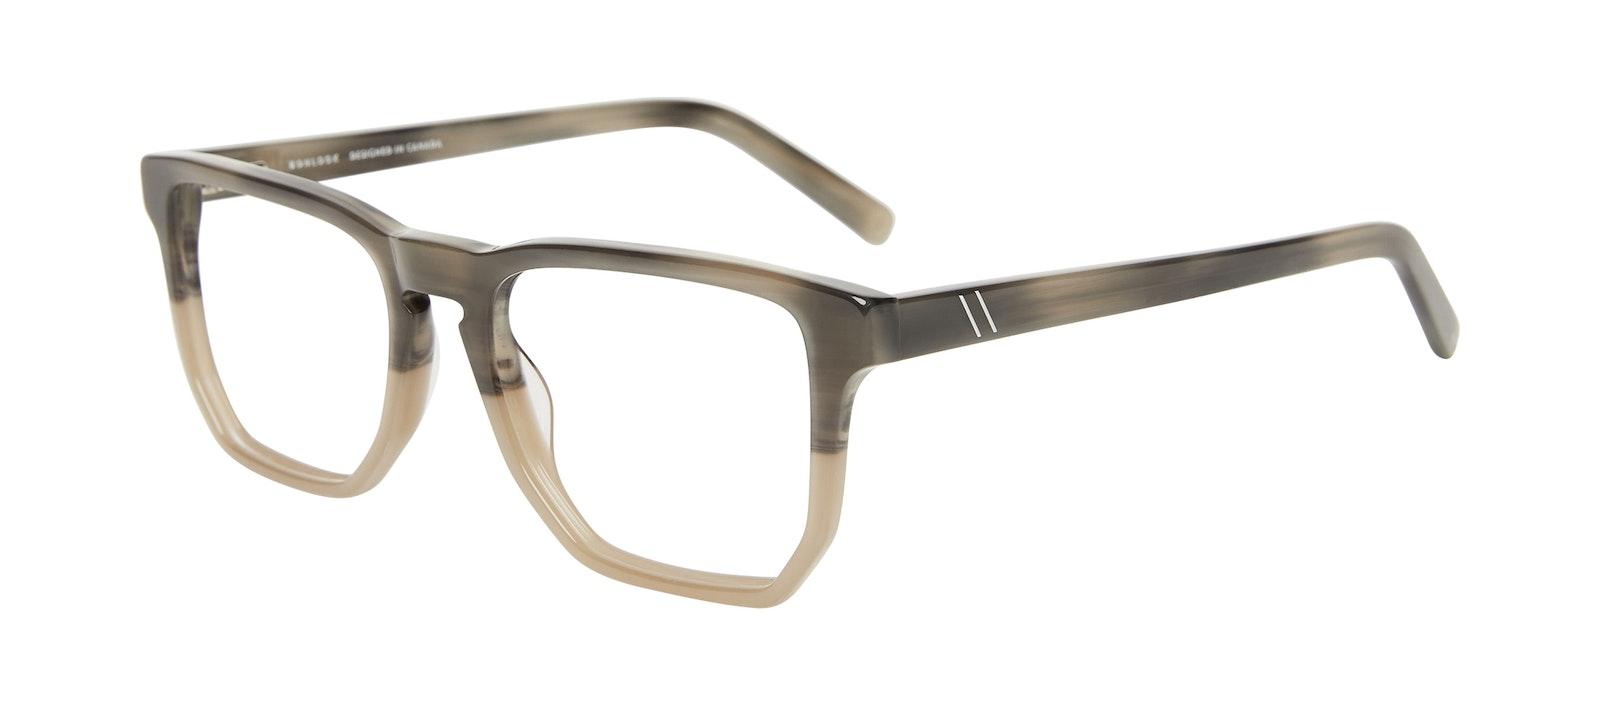 Affordable Fashion Glasses Square Eyeglasses Men Andy Two Tone Stone Tilt